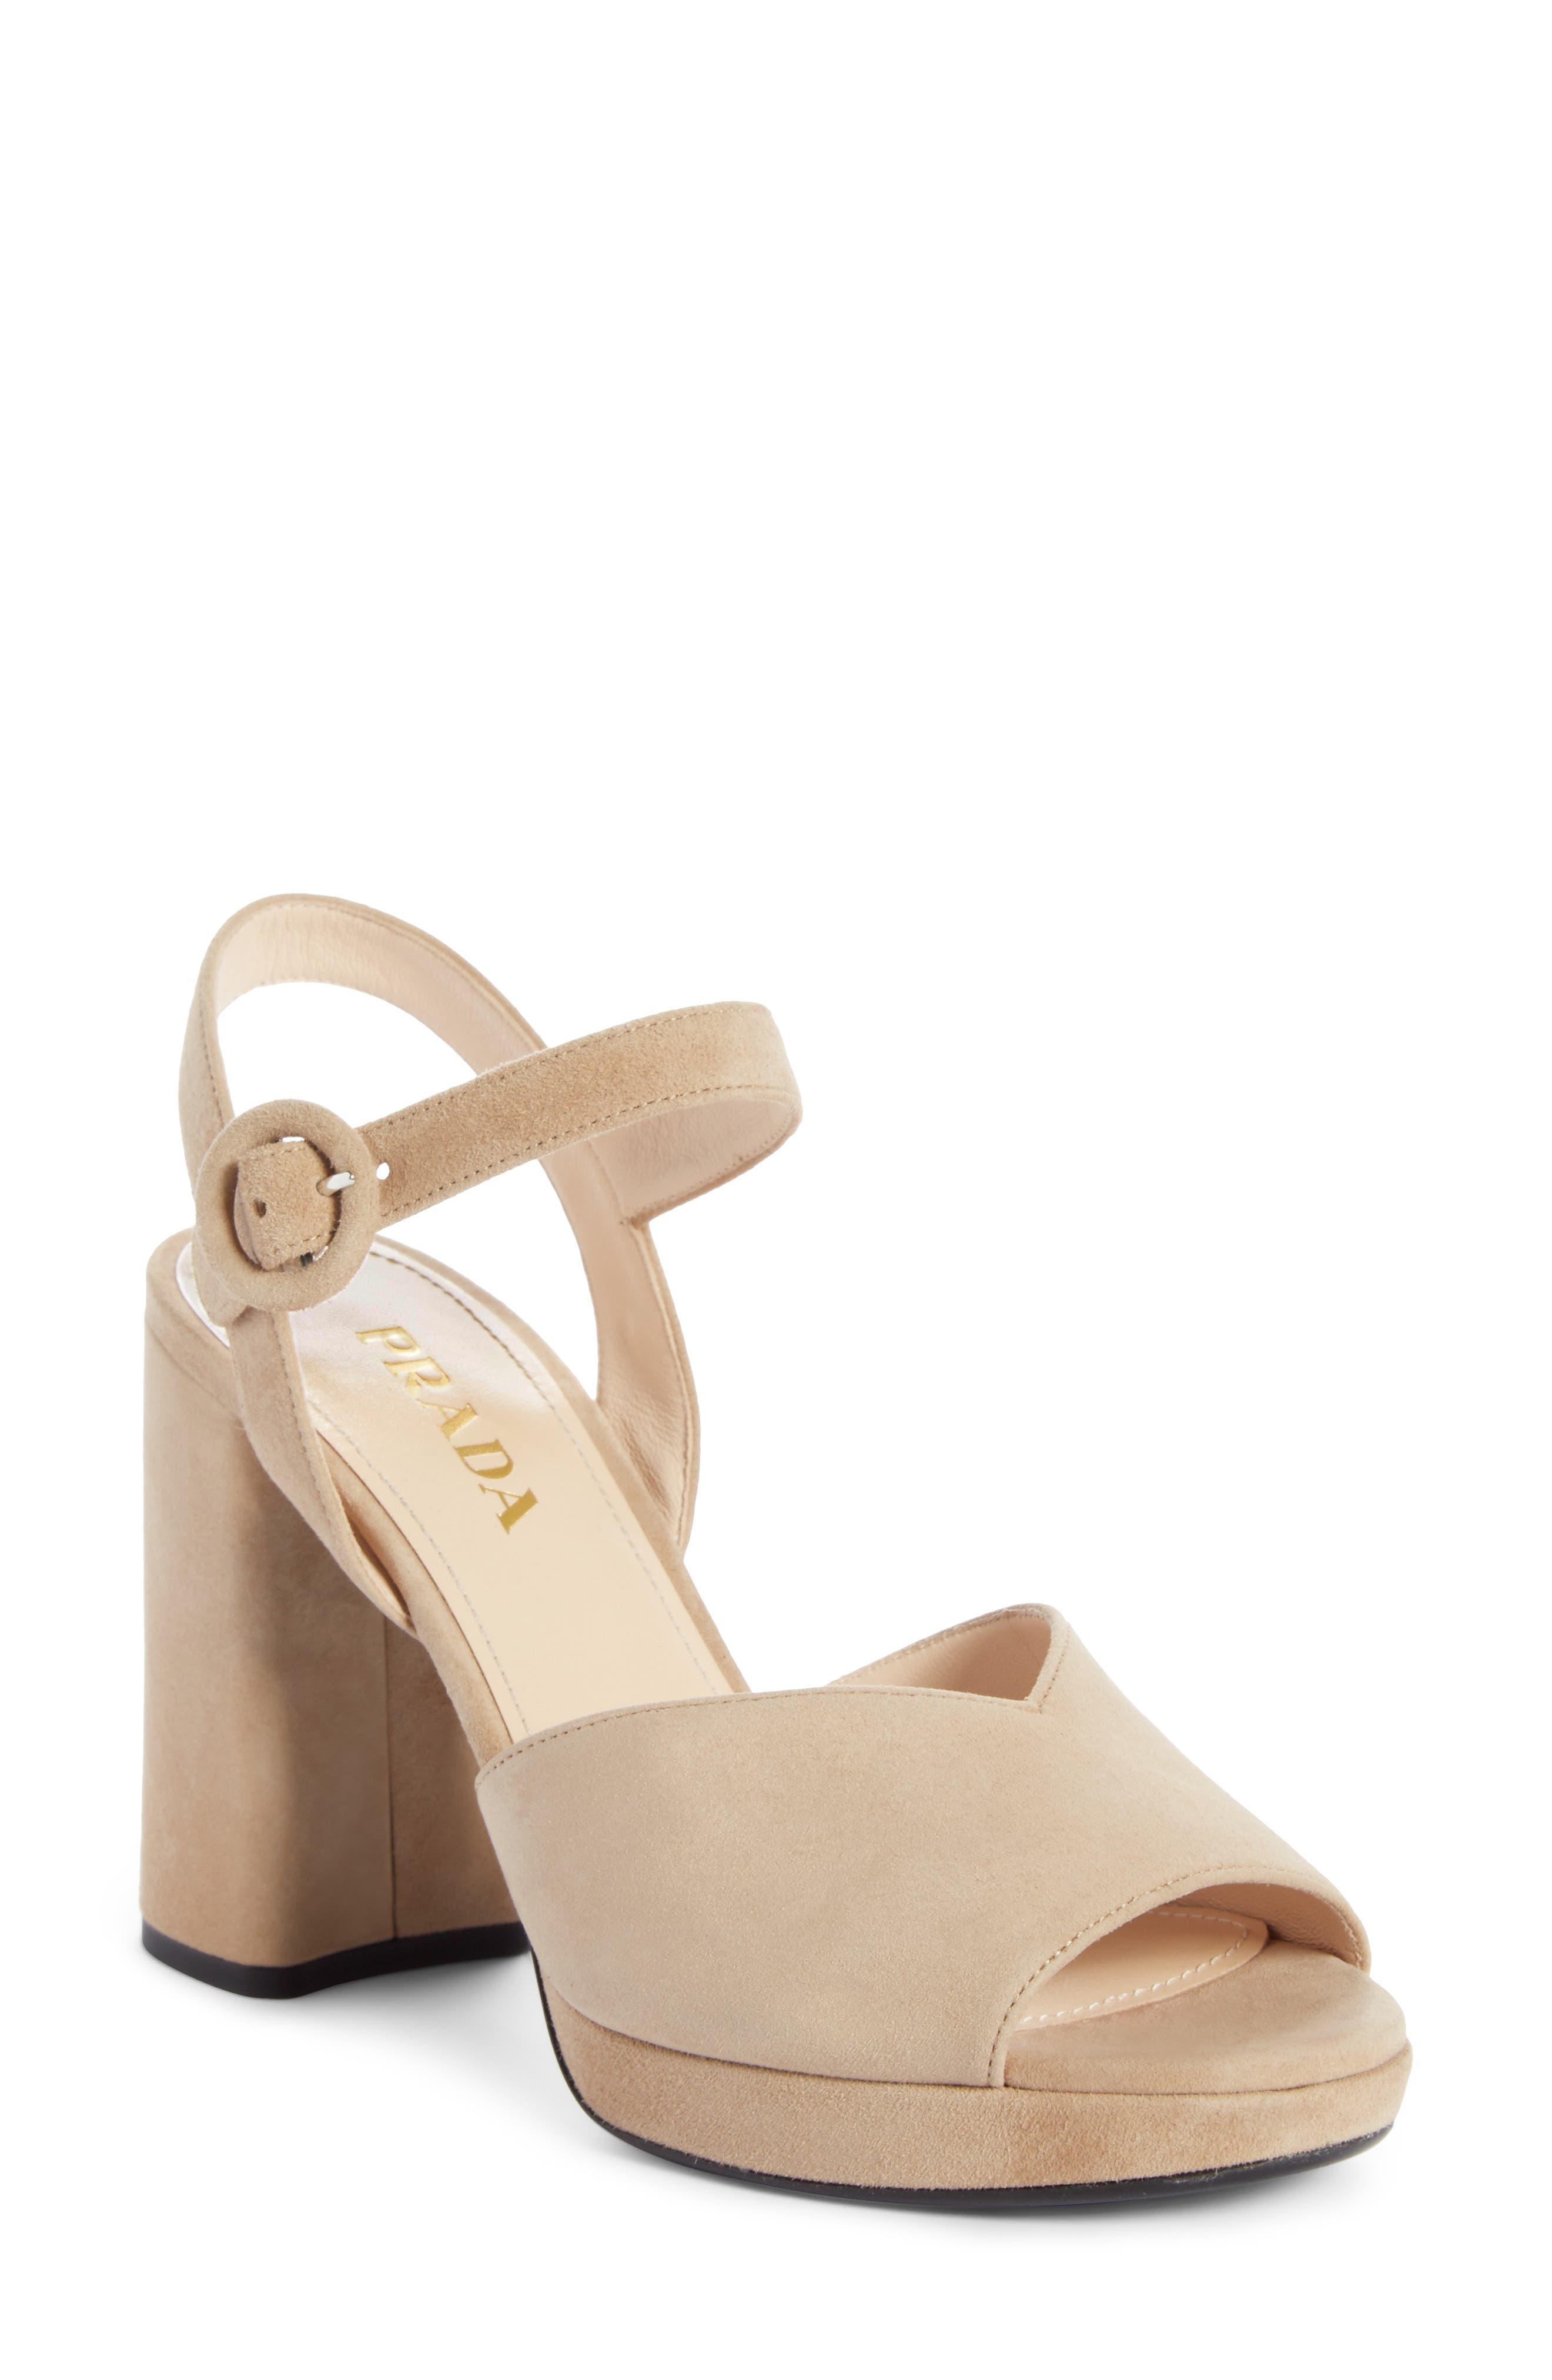 9fd36620634 Prada Sandals for Women